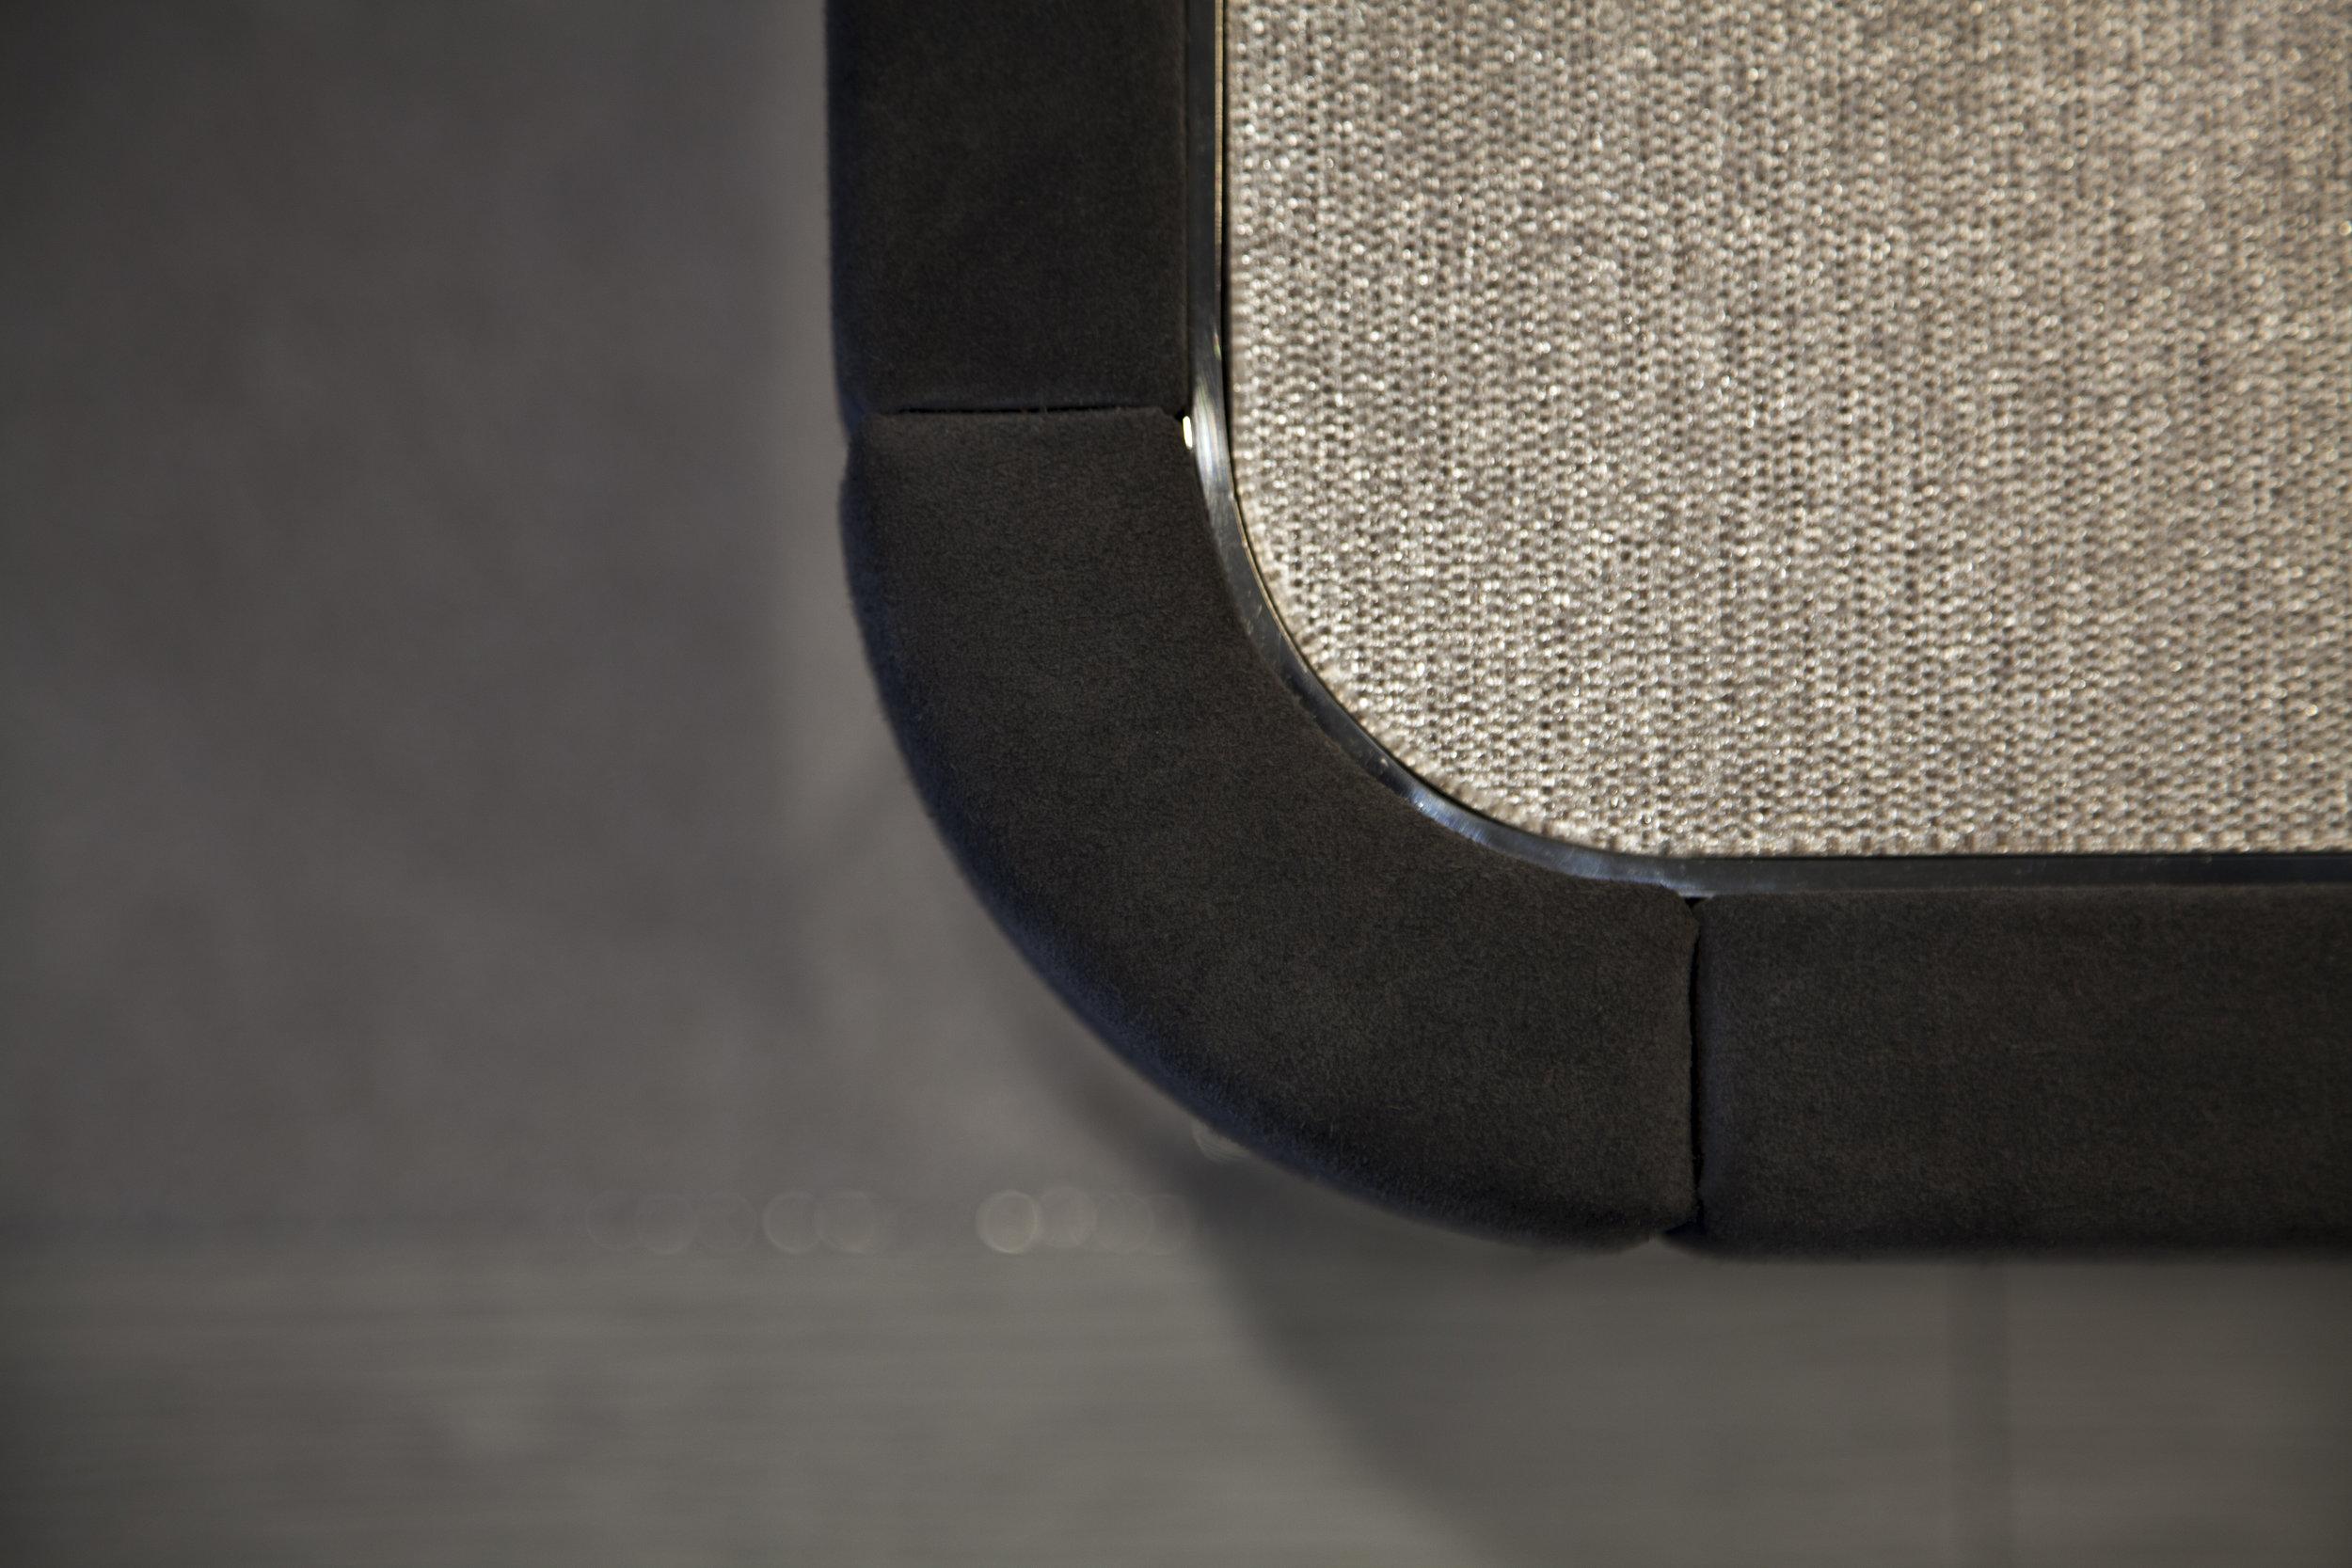 DOMINATOR ILUMEN 28M - CADET V - INTERIOR DESIGN AND PHOTO BY LUCA CATINO (3).jpg